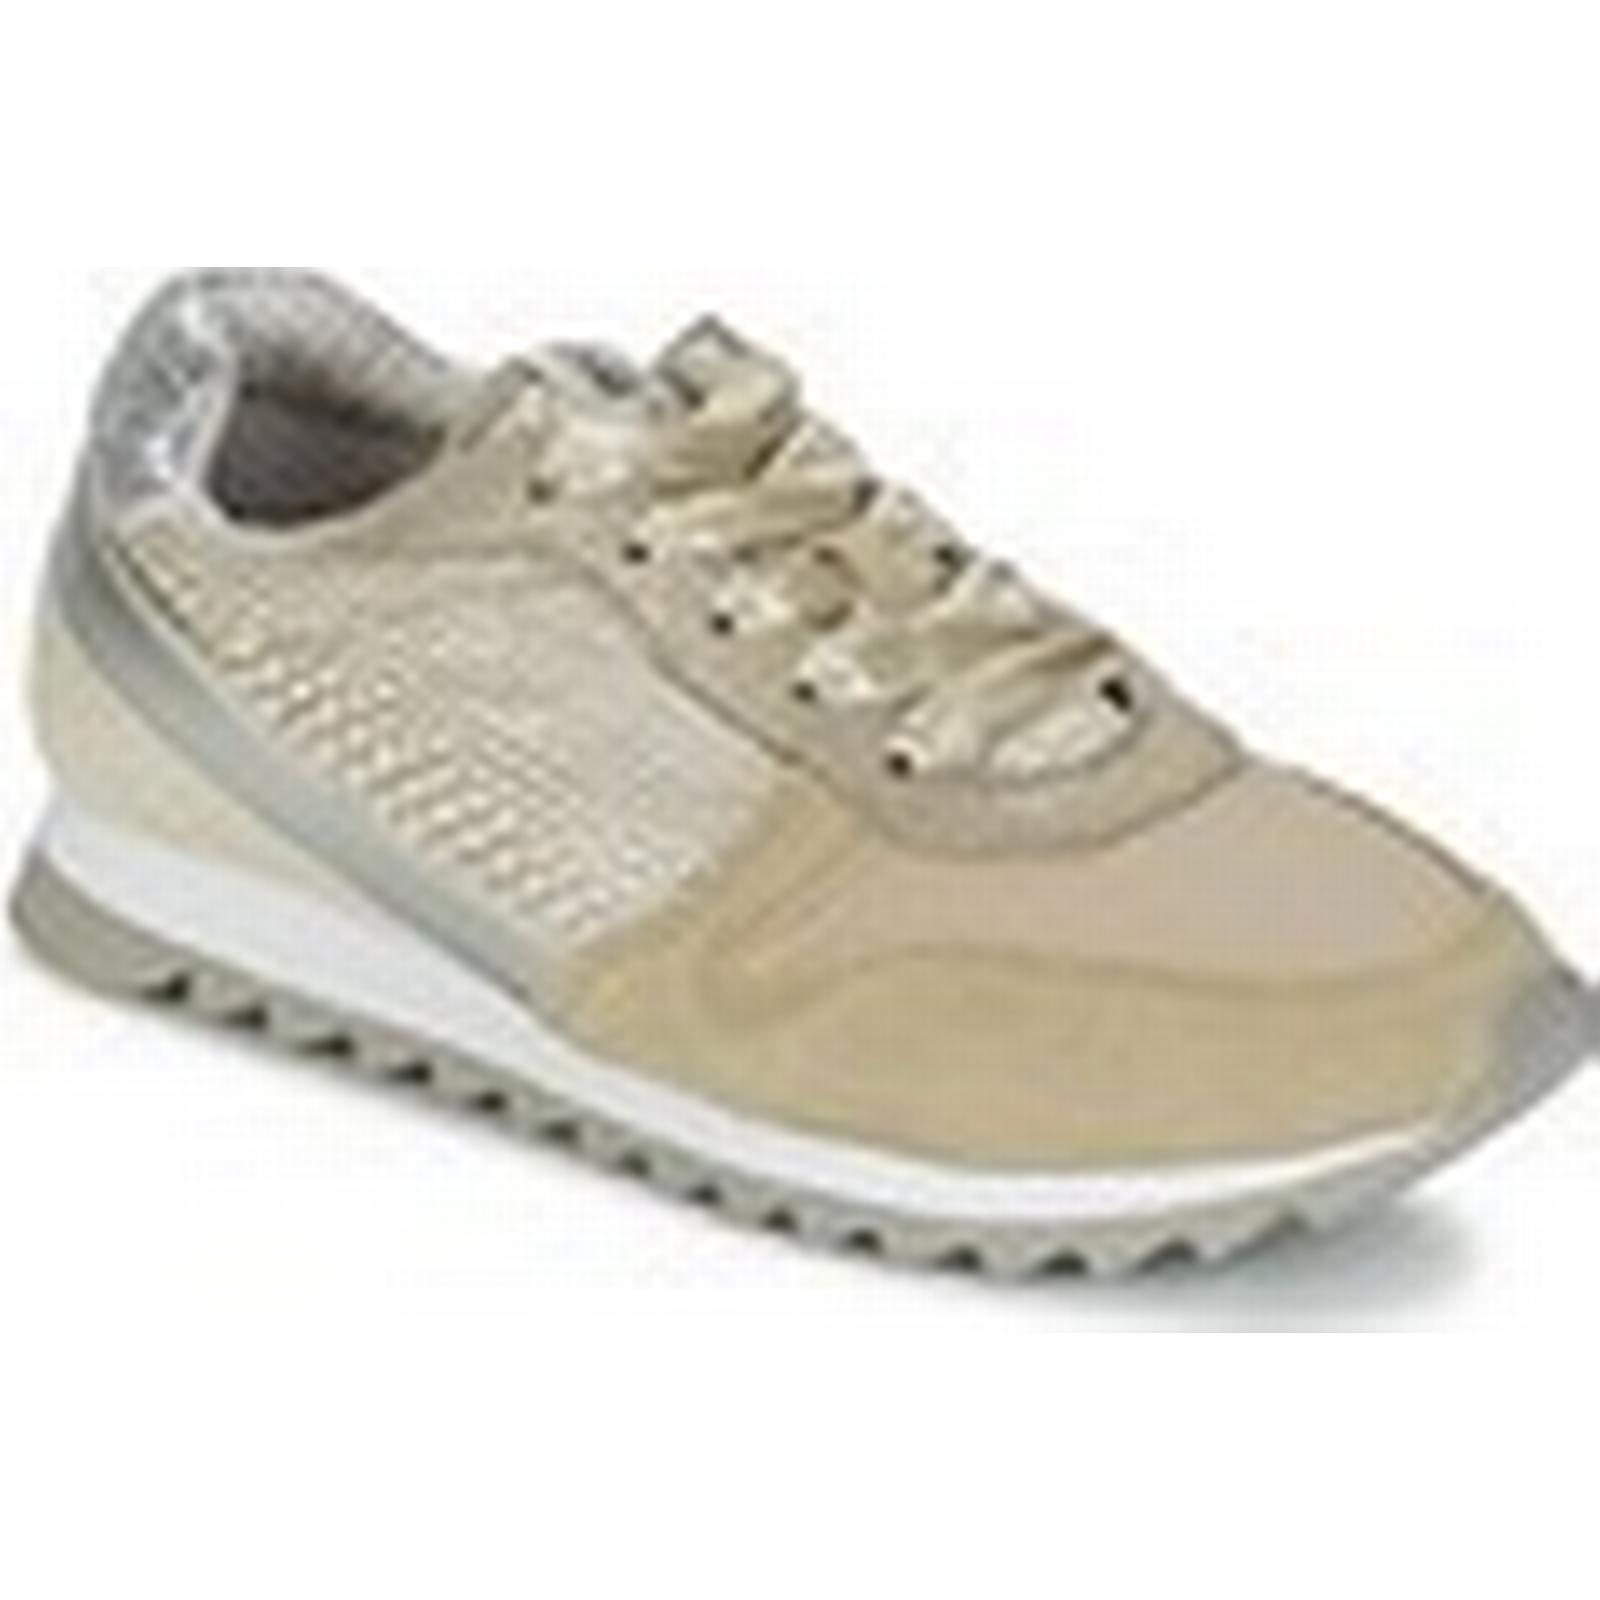 bunker runnar femmes & #  27; s Chaussure Chaussure Chaussure s (formateurs) en beige 74ea38